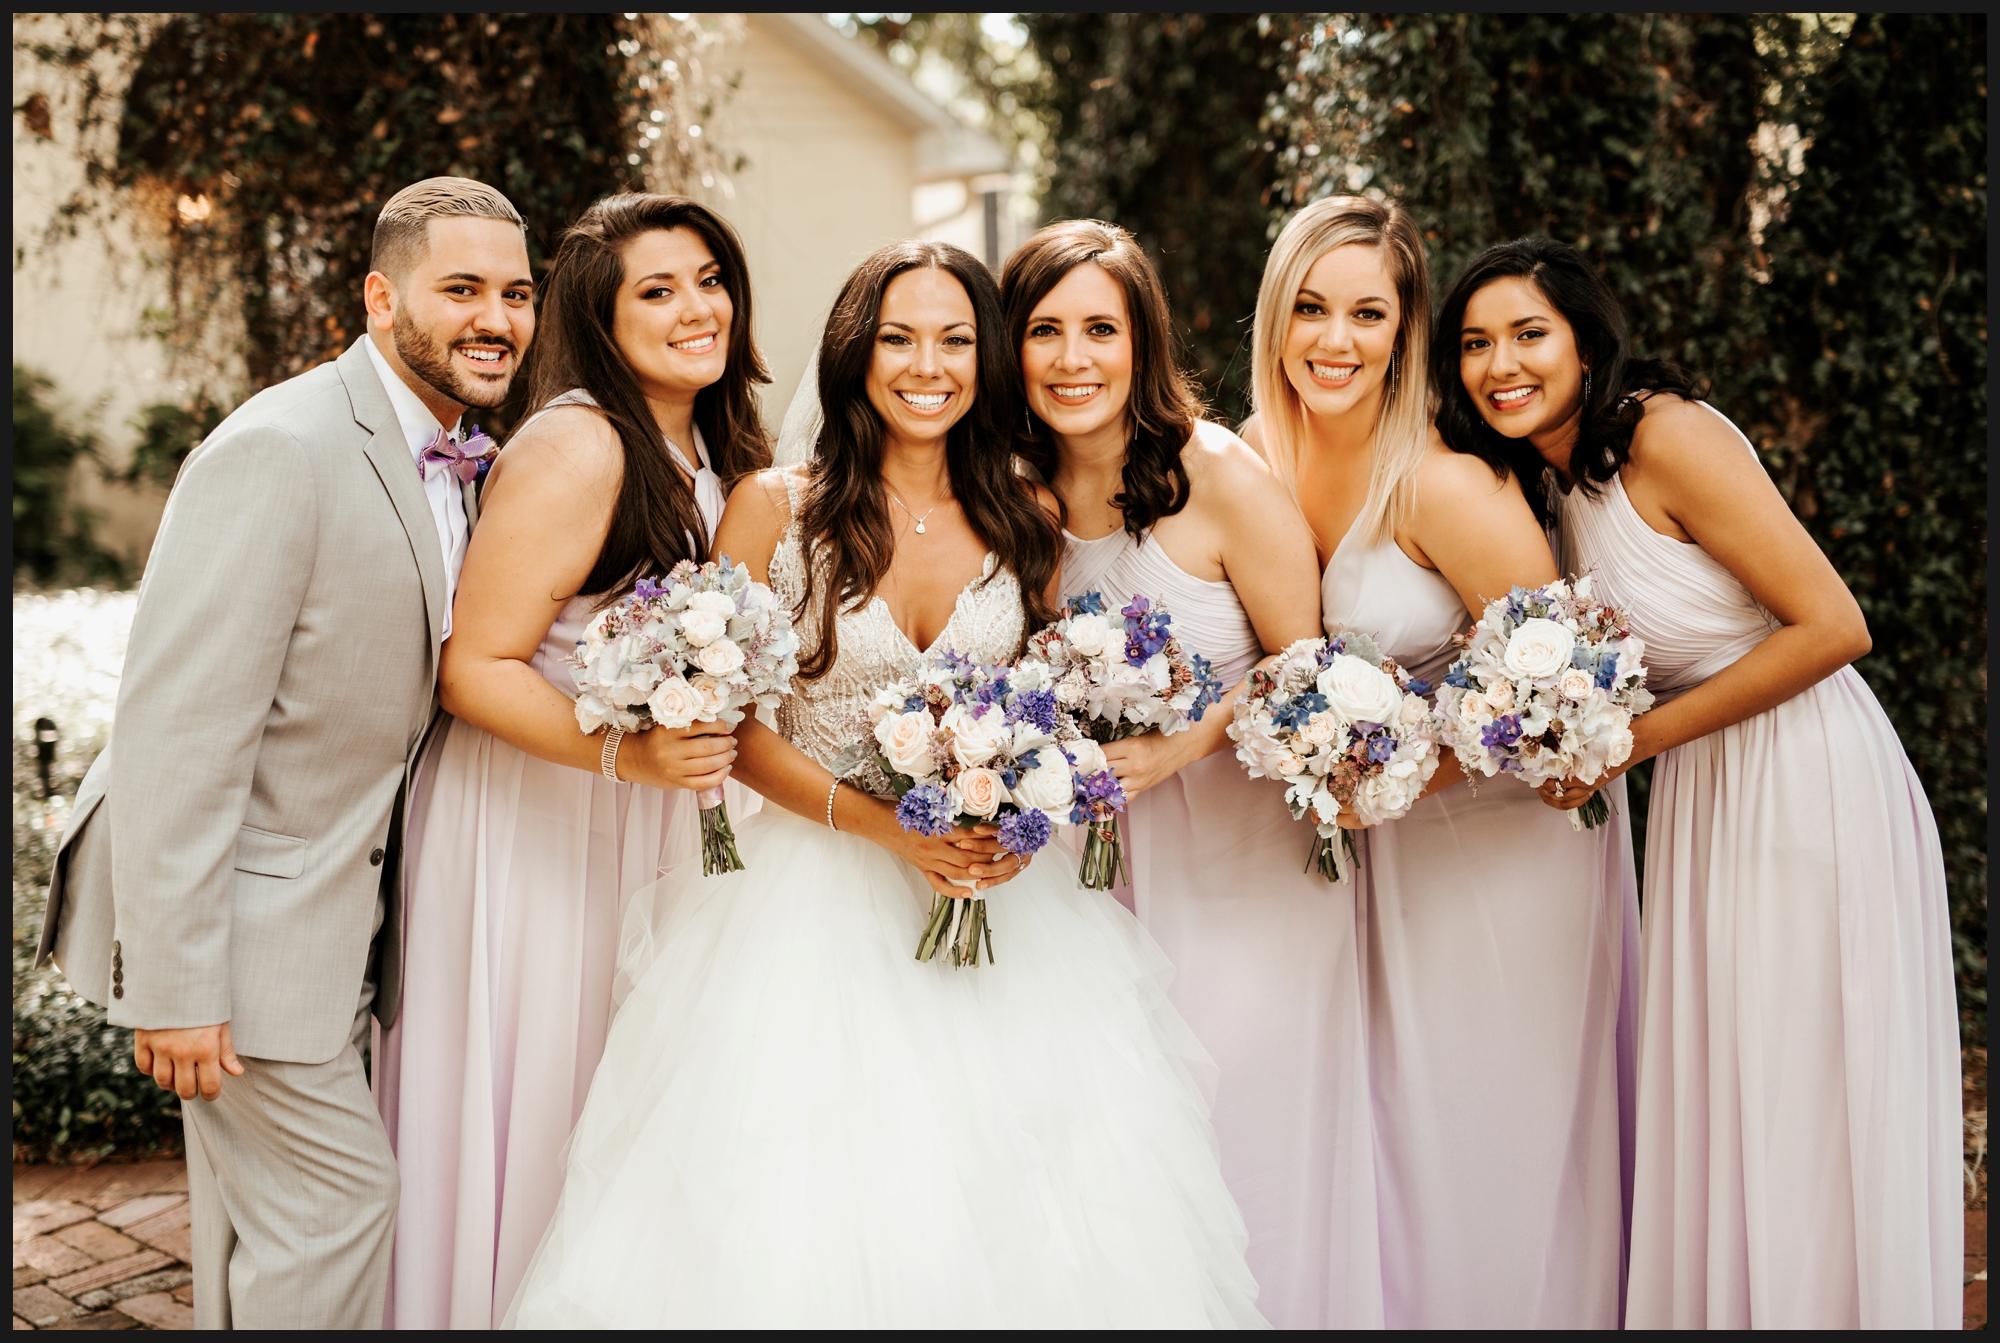 Orlando-Wedding-Photographer-destination-wedding-photographer-florida-wedding-photographer-bohemian-wedding-photographer_1601.jpg